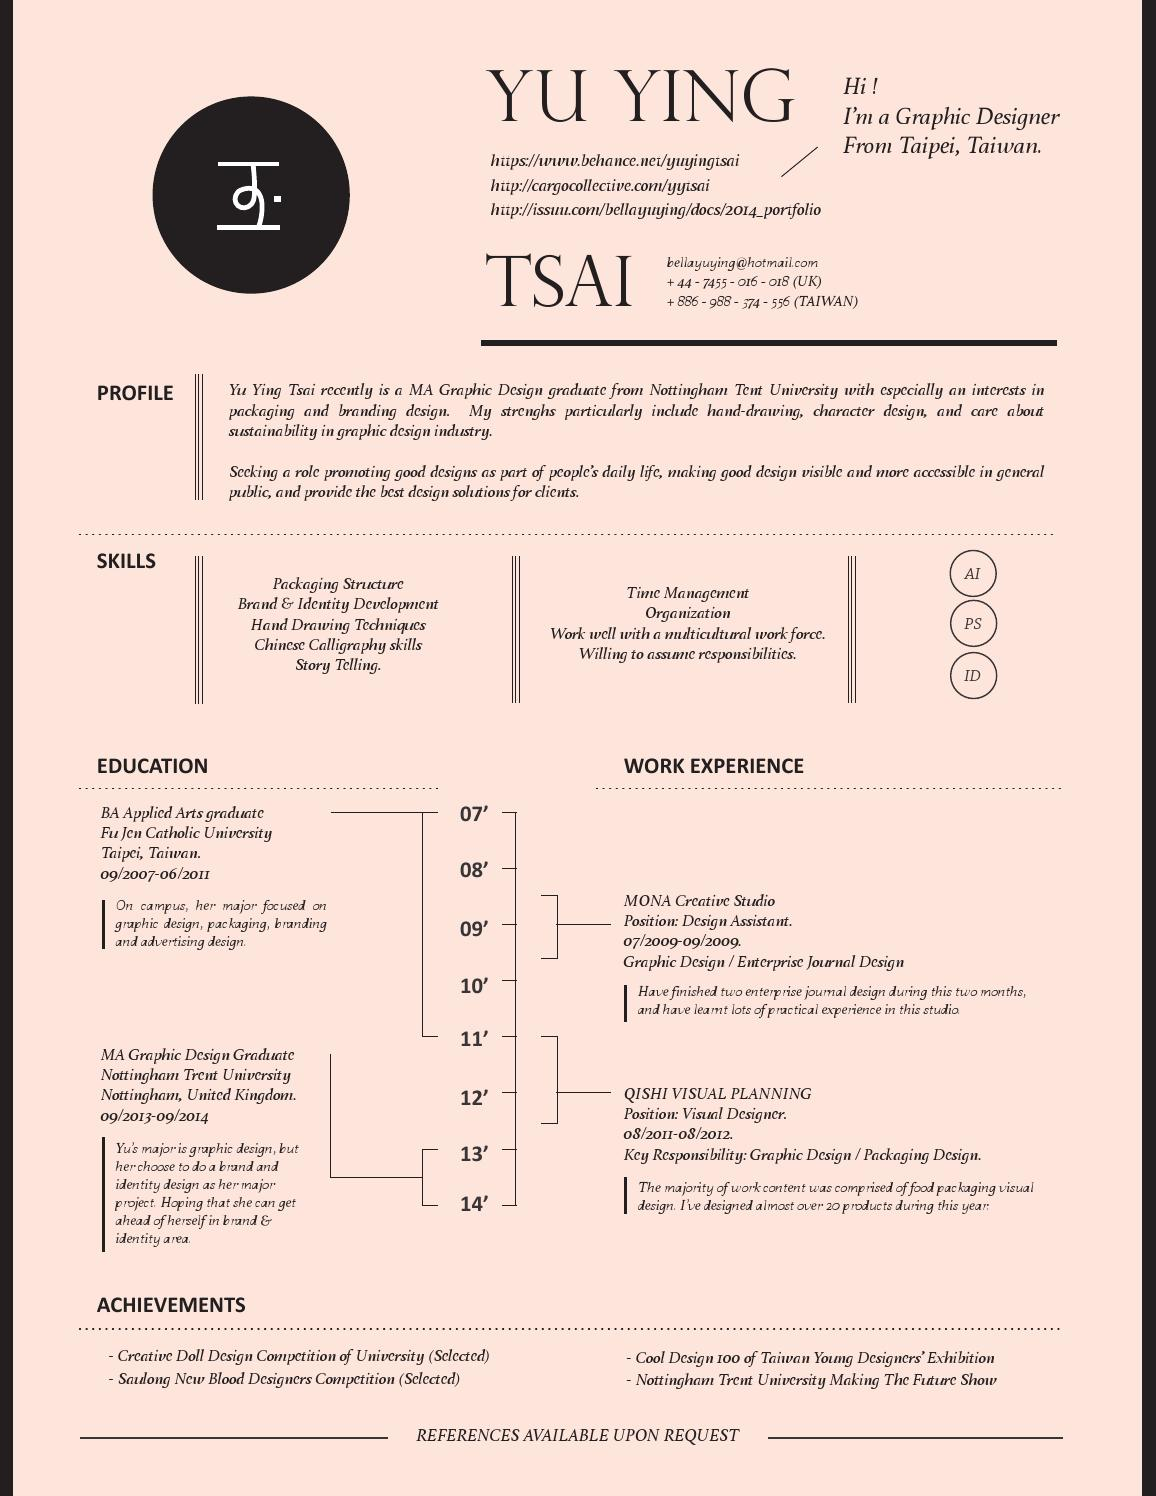 yu ying tsai 2014 by bella tsai